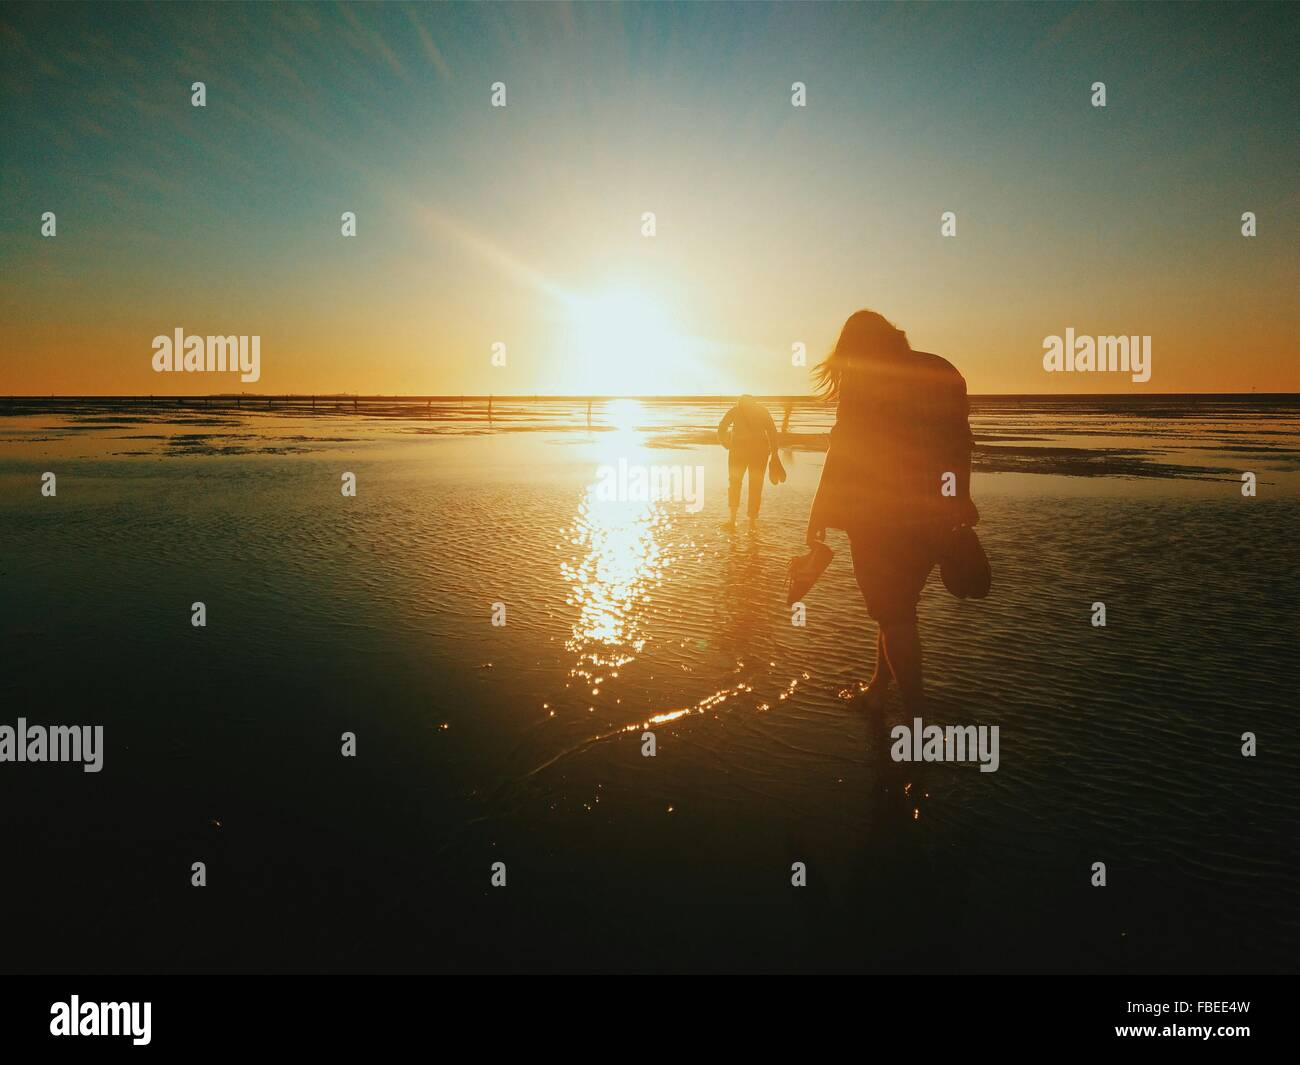 Silhouette Menschen zu Fuß am Strand bei Sonnenuntergang Stockbild